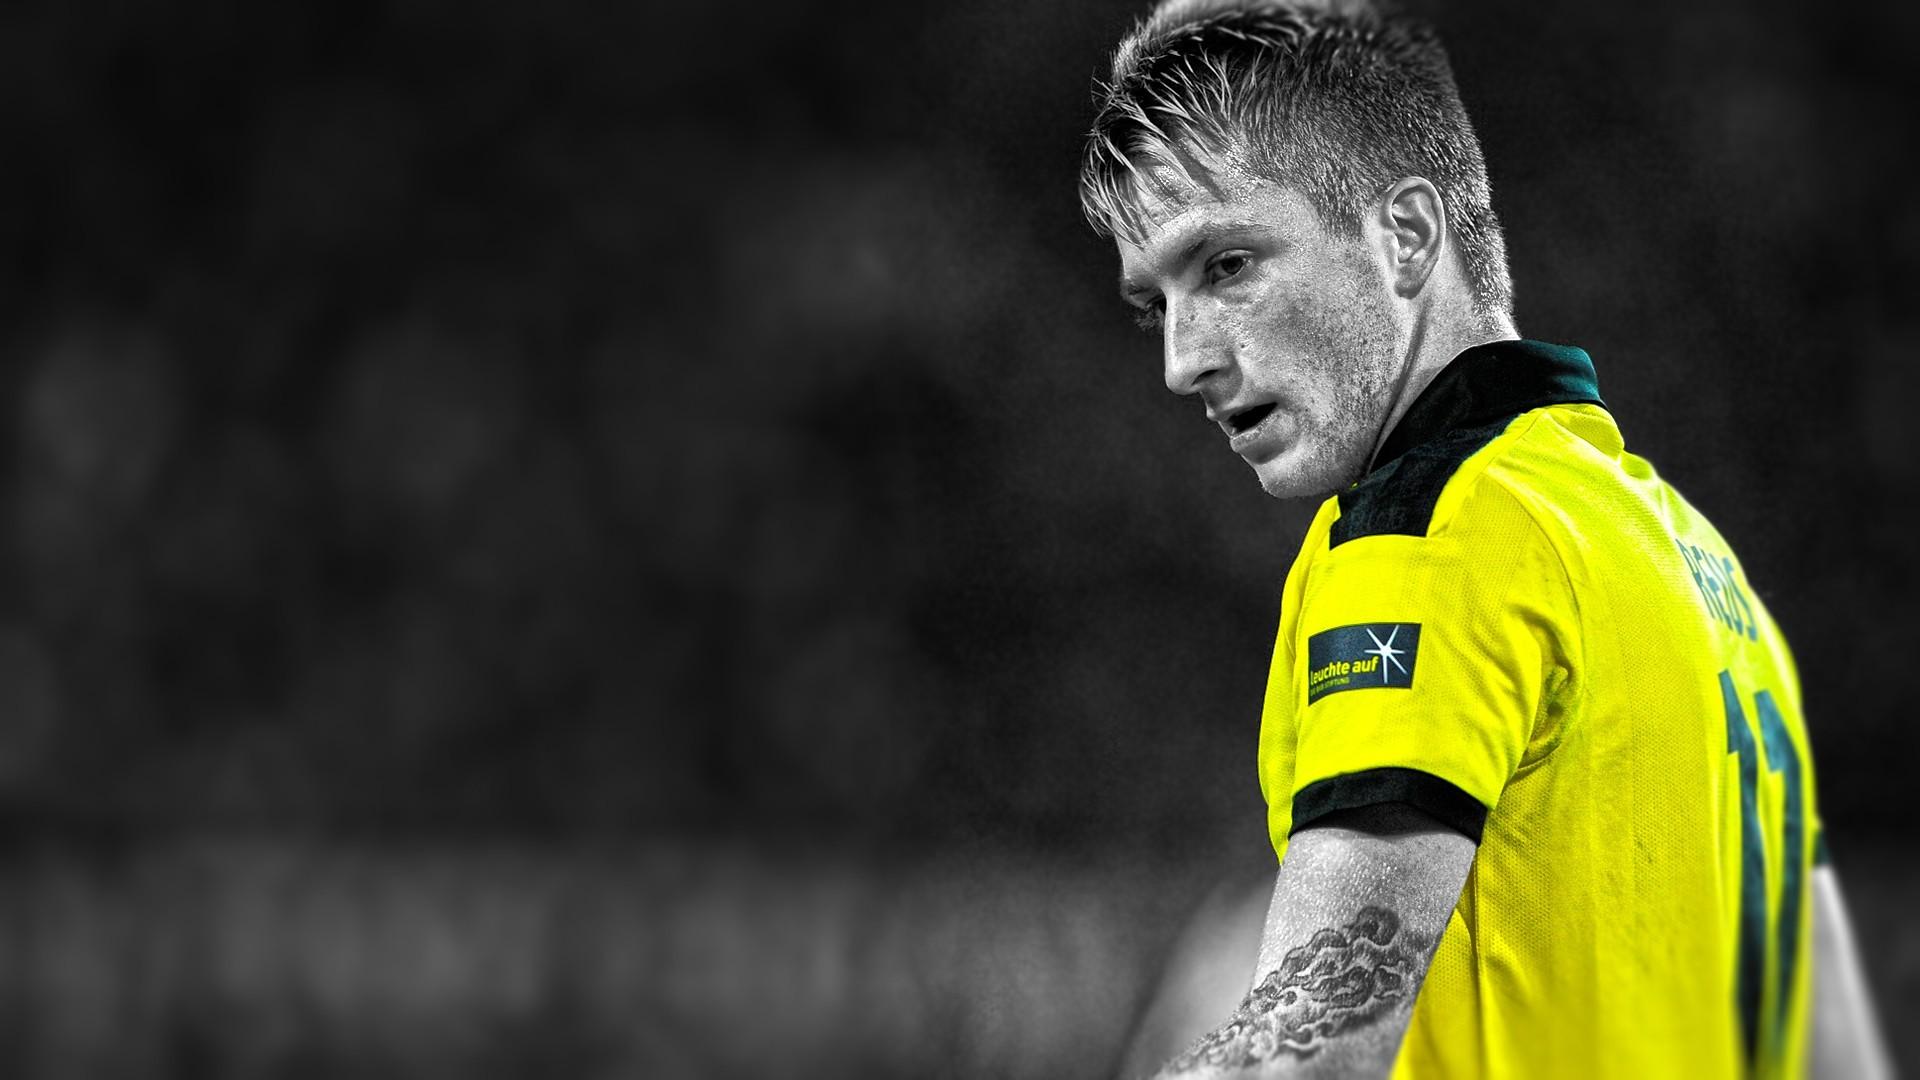 Marco Reus Borussia Dortmund Soccer Bvb Bundesliga Wallpaper Resolution 1920x1080 Id 413188 Wallha Com